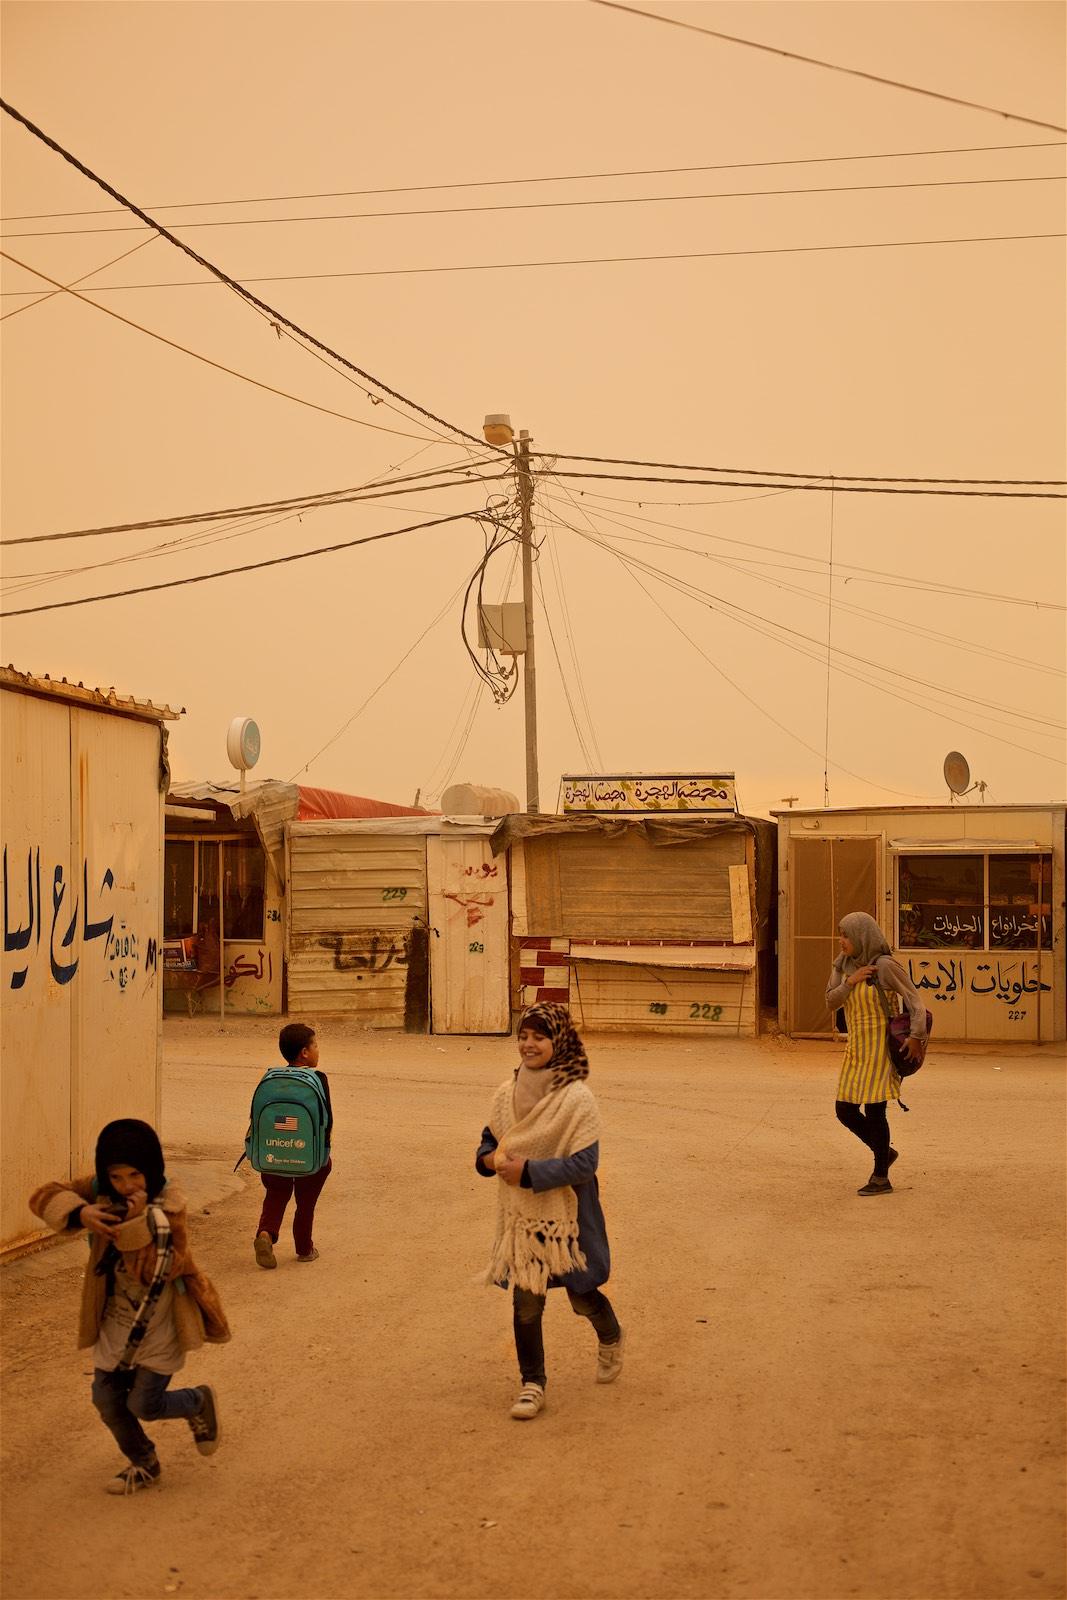 denis-bosnic-zaatari-jordan-refugee-camp-14.jpg